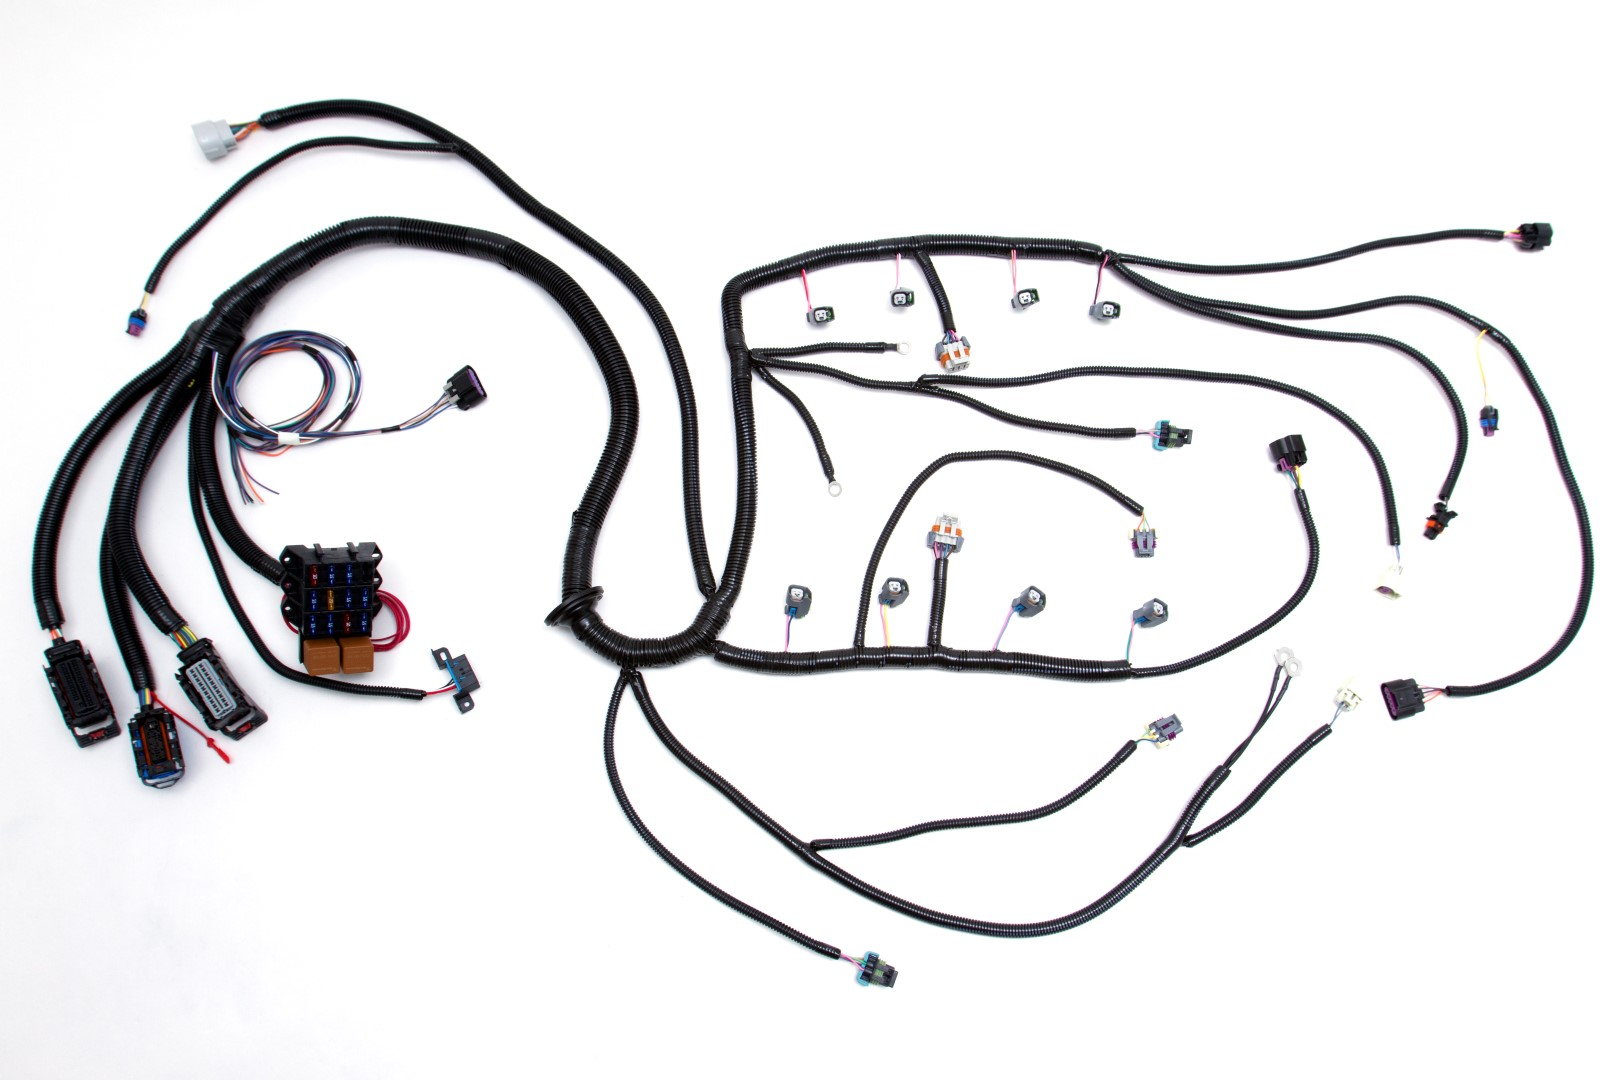 '06 '13 ls7 (7 0l) standalone wiring harness w 4l60e utility trailer wiring harness ls7 wiring harness #4